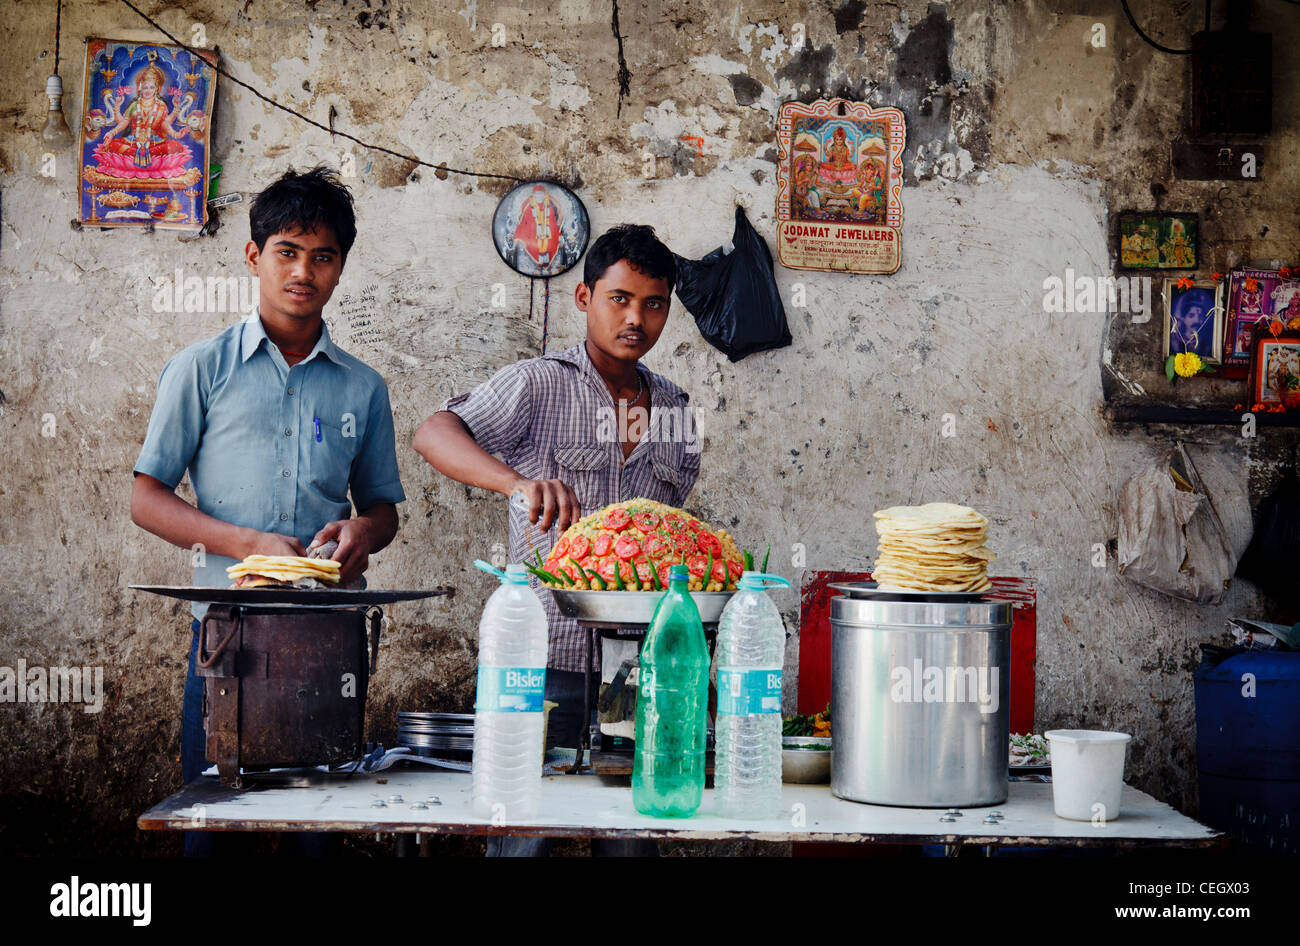 Food dans le bazar de Bombay, Mumbai Photo Stock